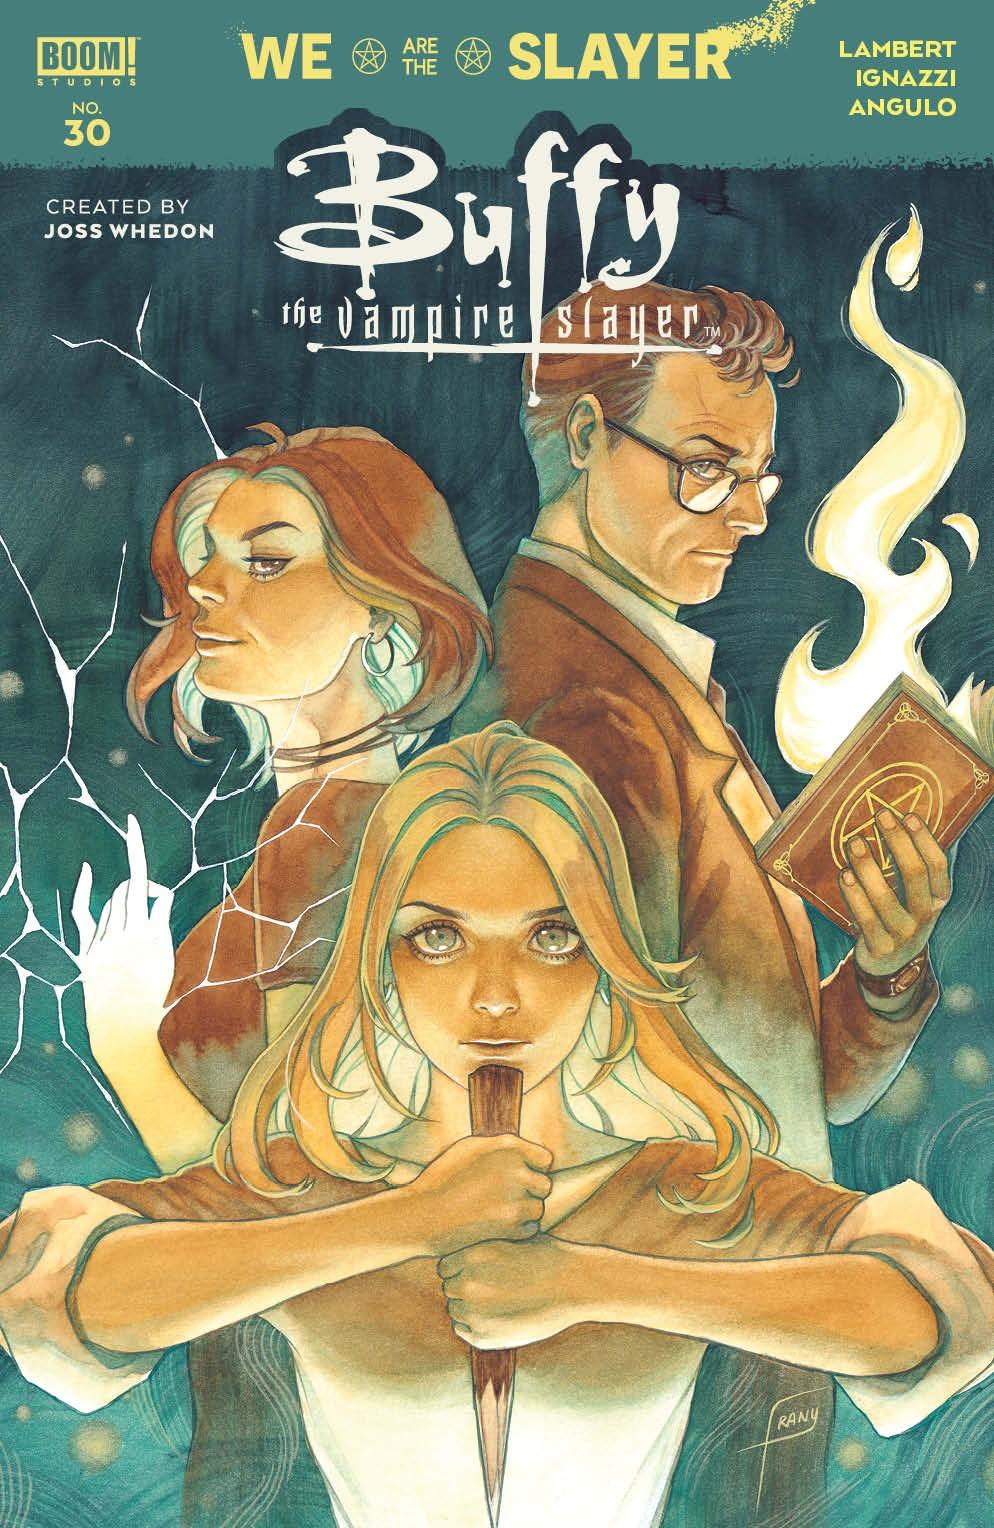 Buffy_030_Cover_A_Main ComicList Previews: BUFFY THE VAMPIRE SLAYER #30